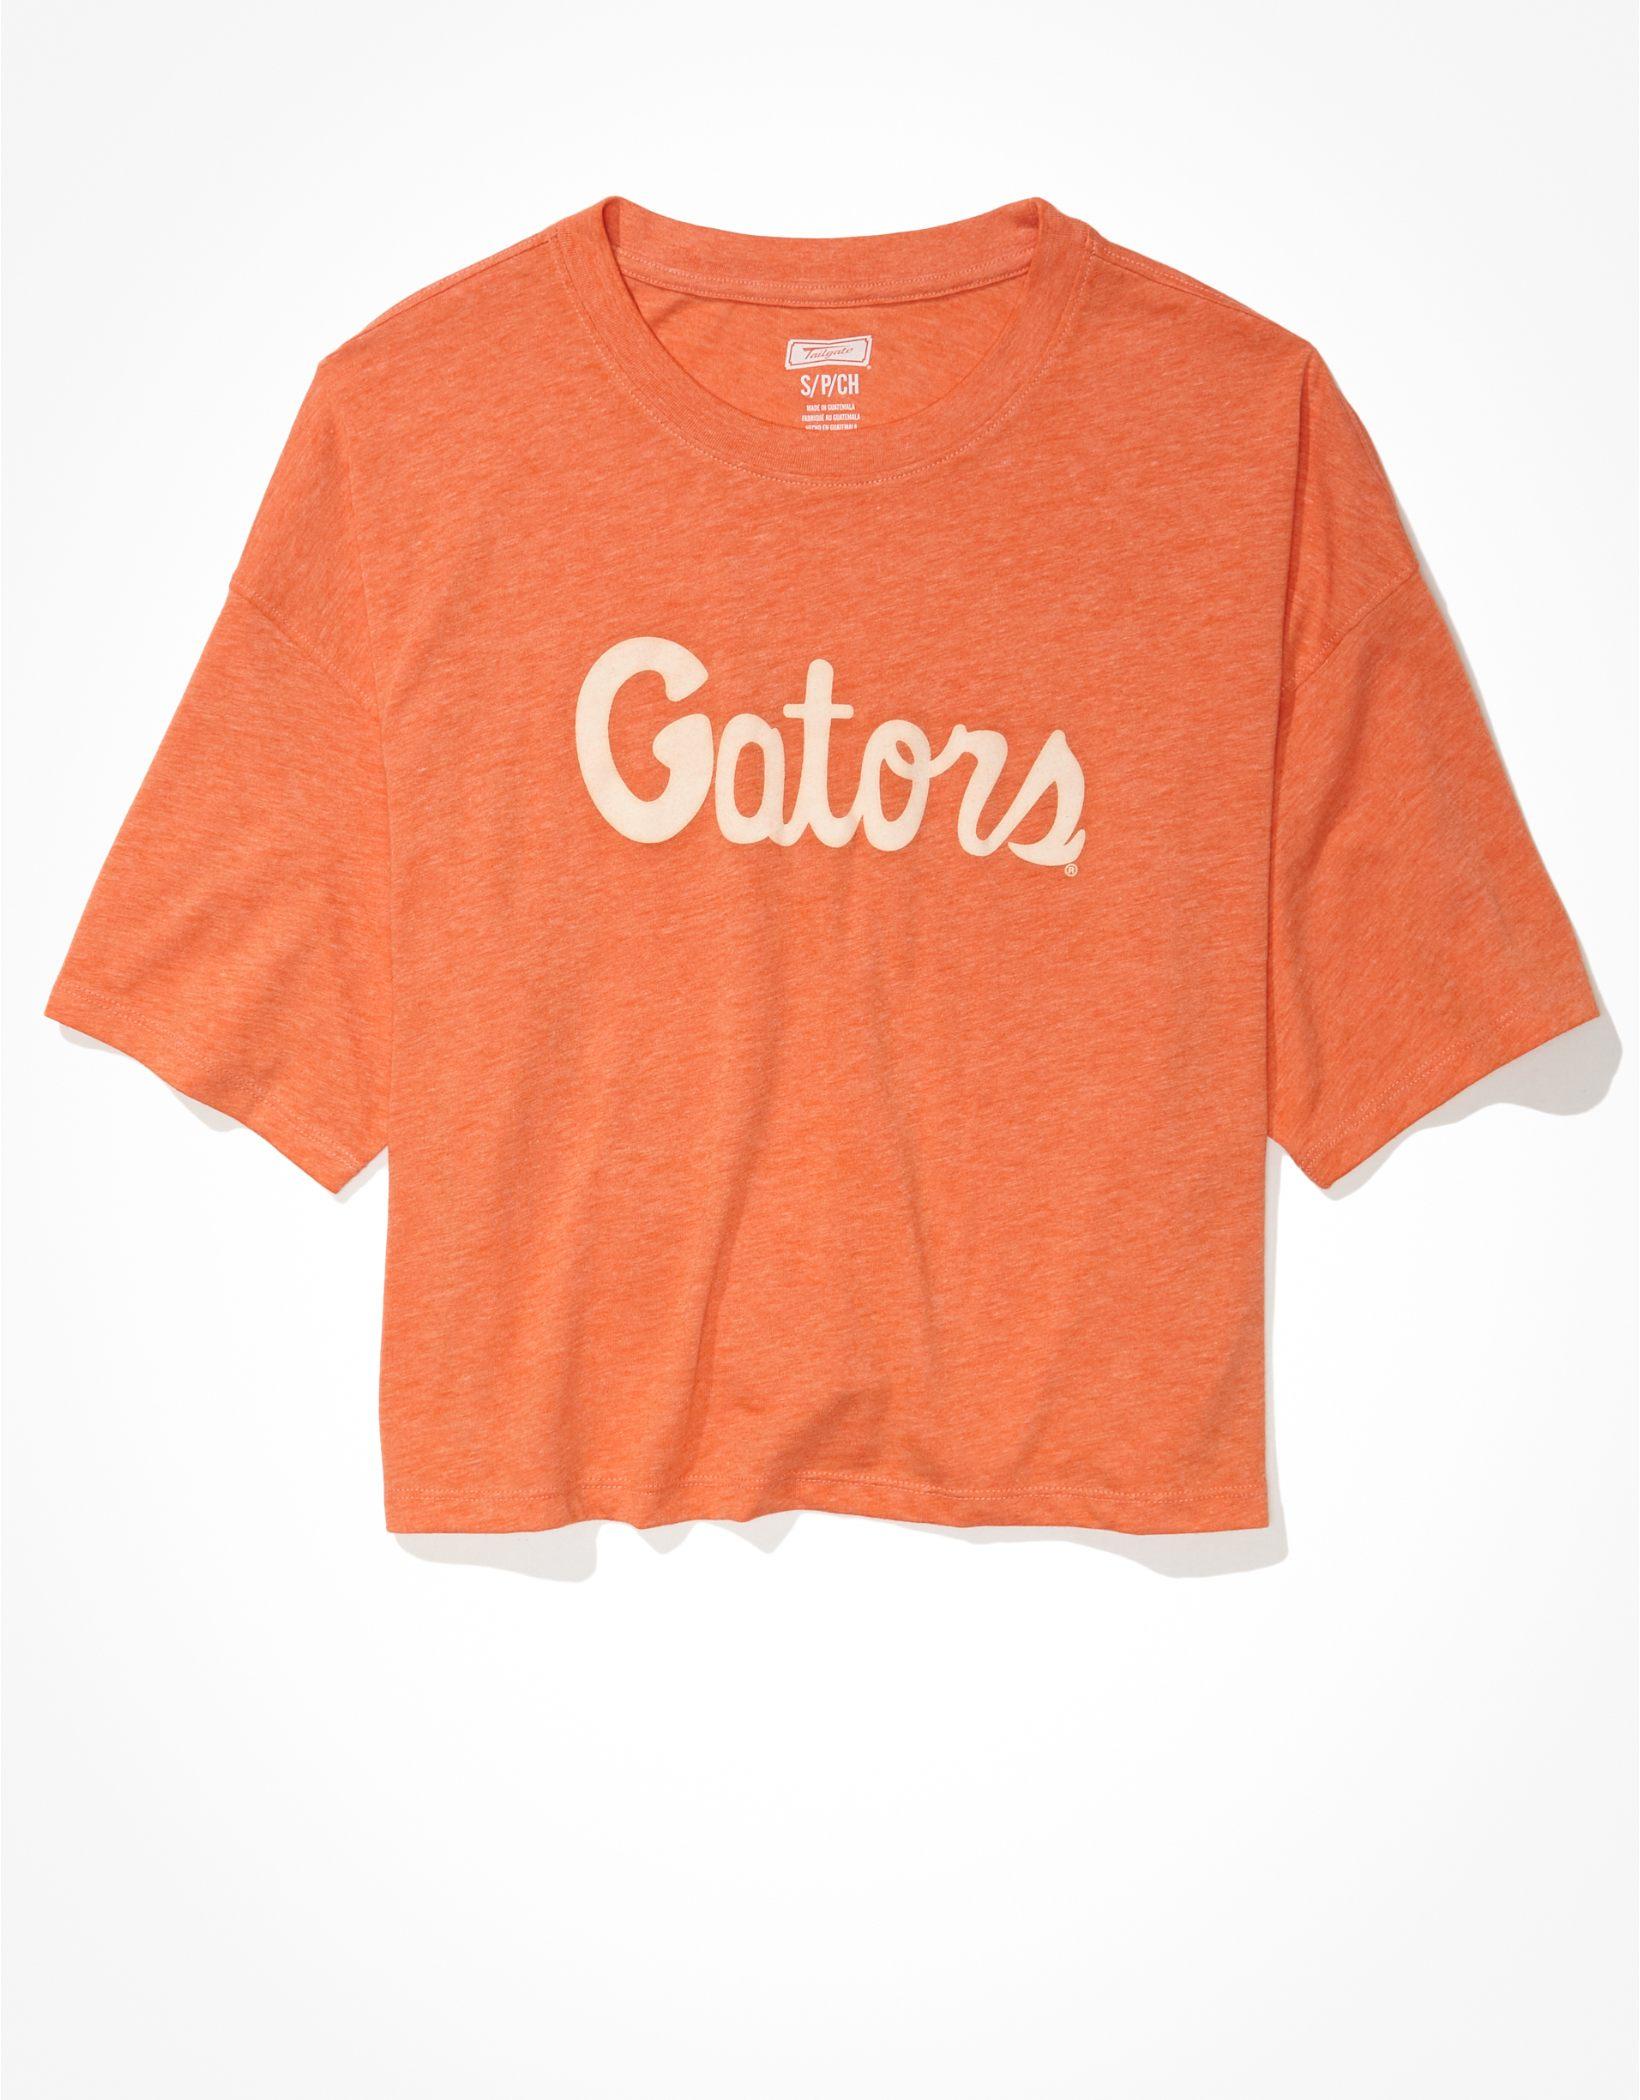 Tailgate Women's Florida Gators Cropped Graphic T-Shirt